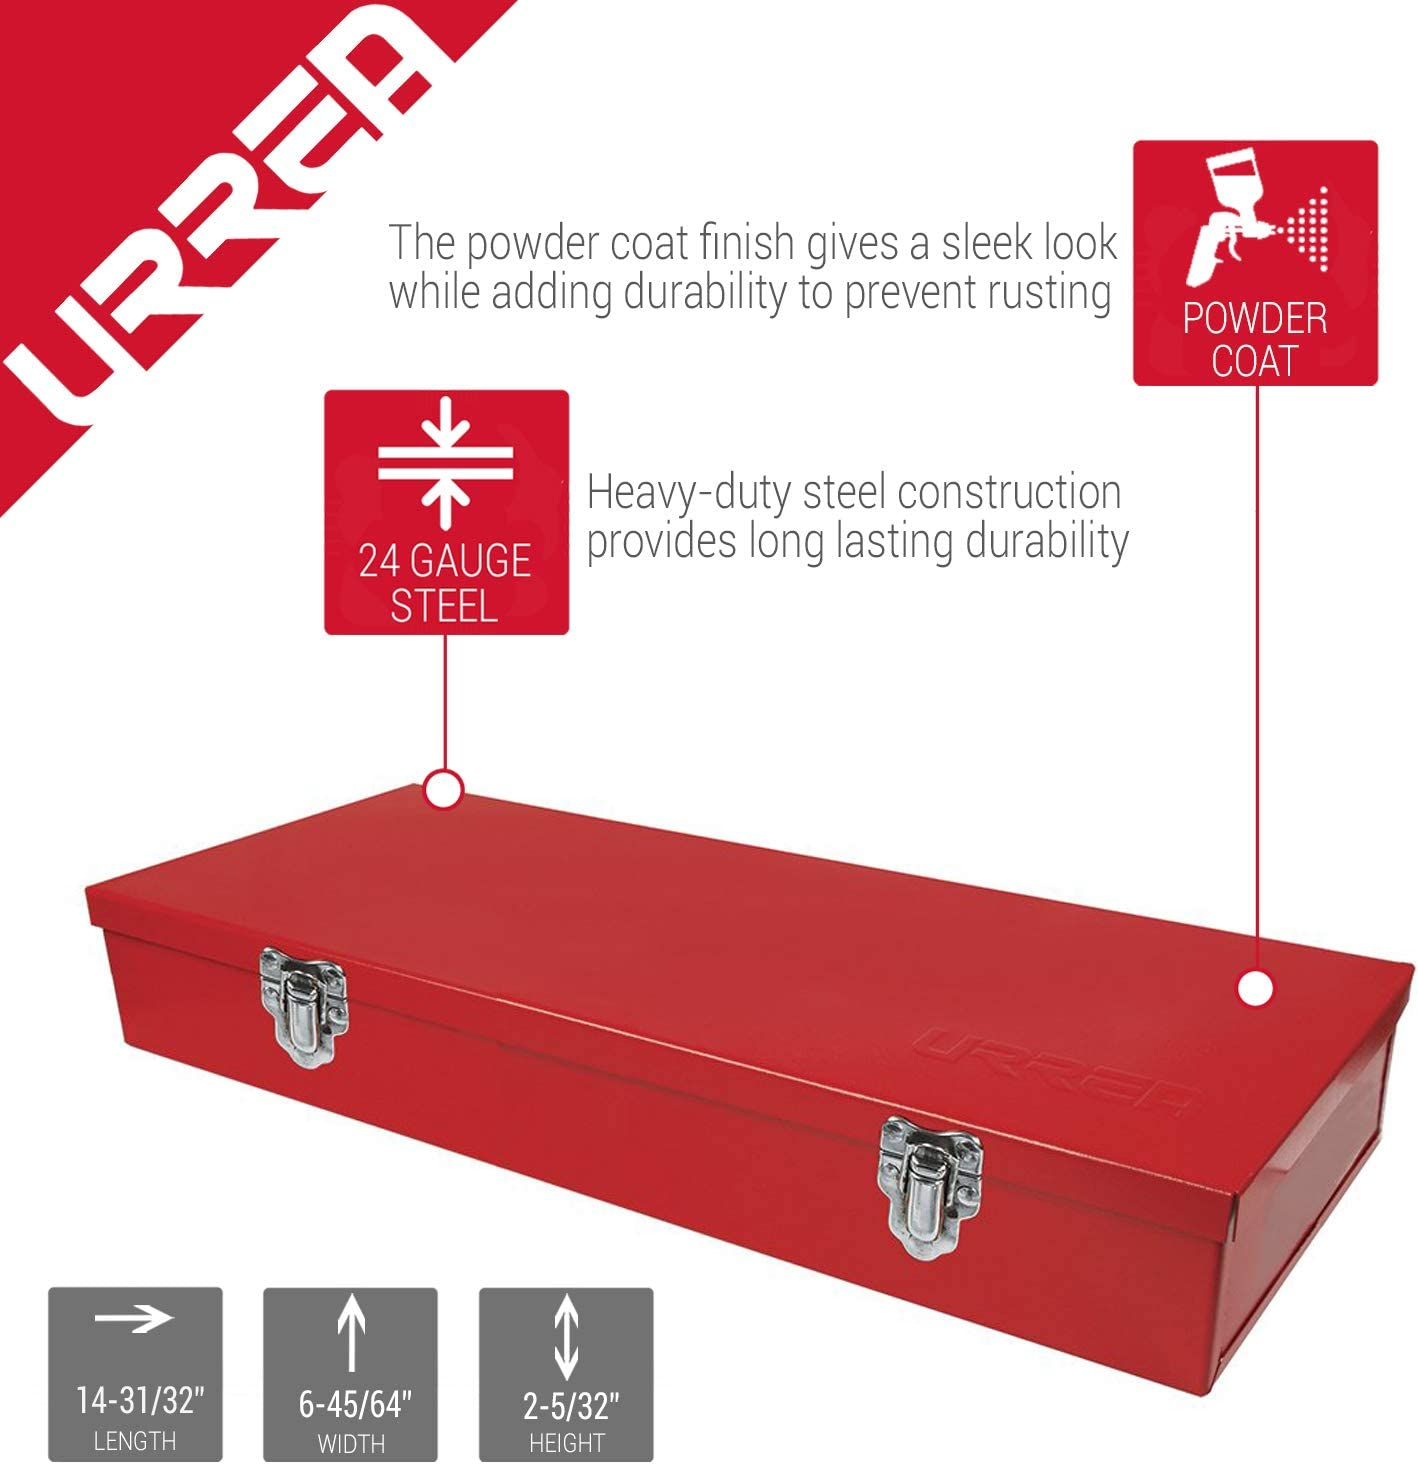 5396 URREA Metal Tool Box 15 x 6.7 x 2.2 Tool Storage//Organization Box with 24 Gauge Construction /& Durable Red Finish